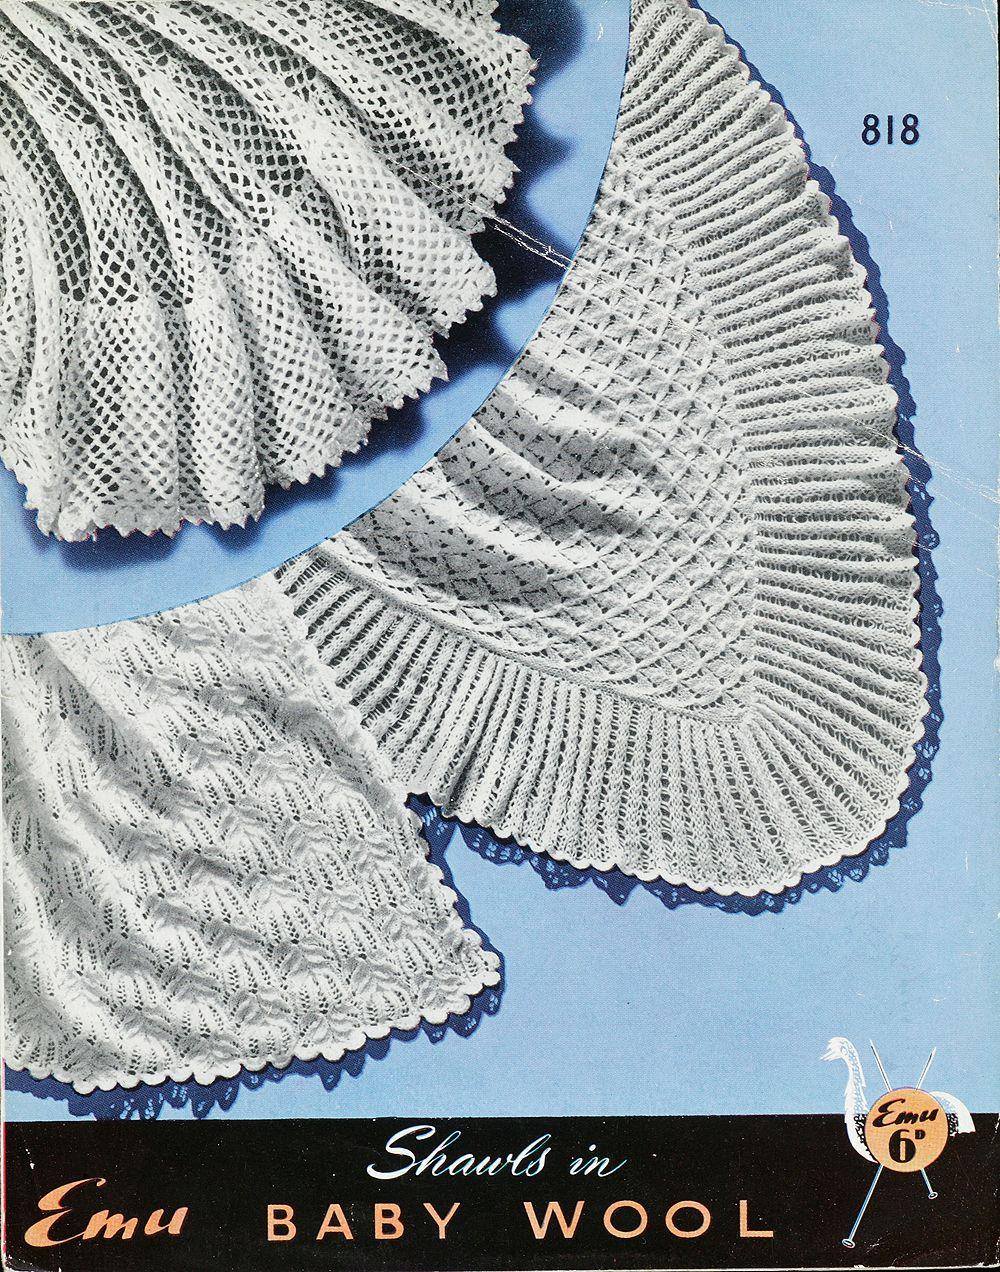 1940s Patterns to Knit   V&A   fibre   Pinterest   Textiles y Tejido